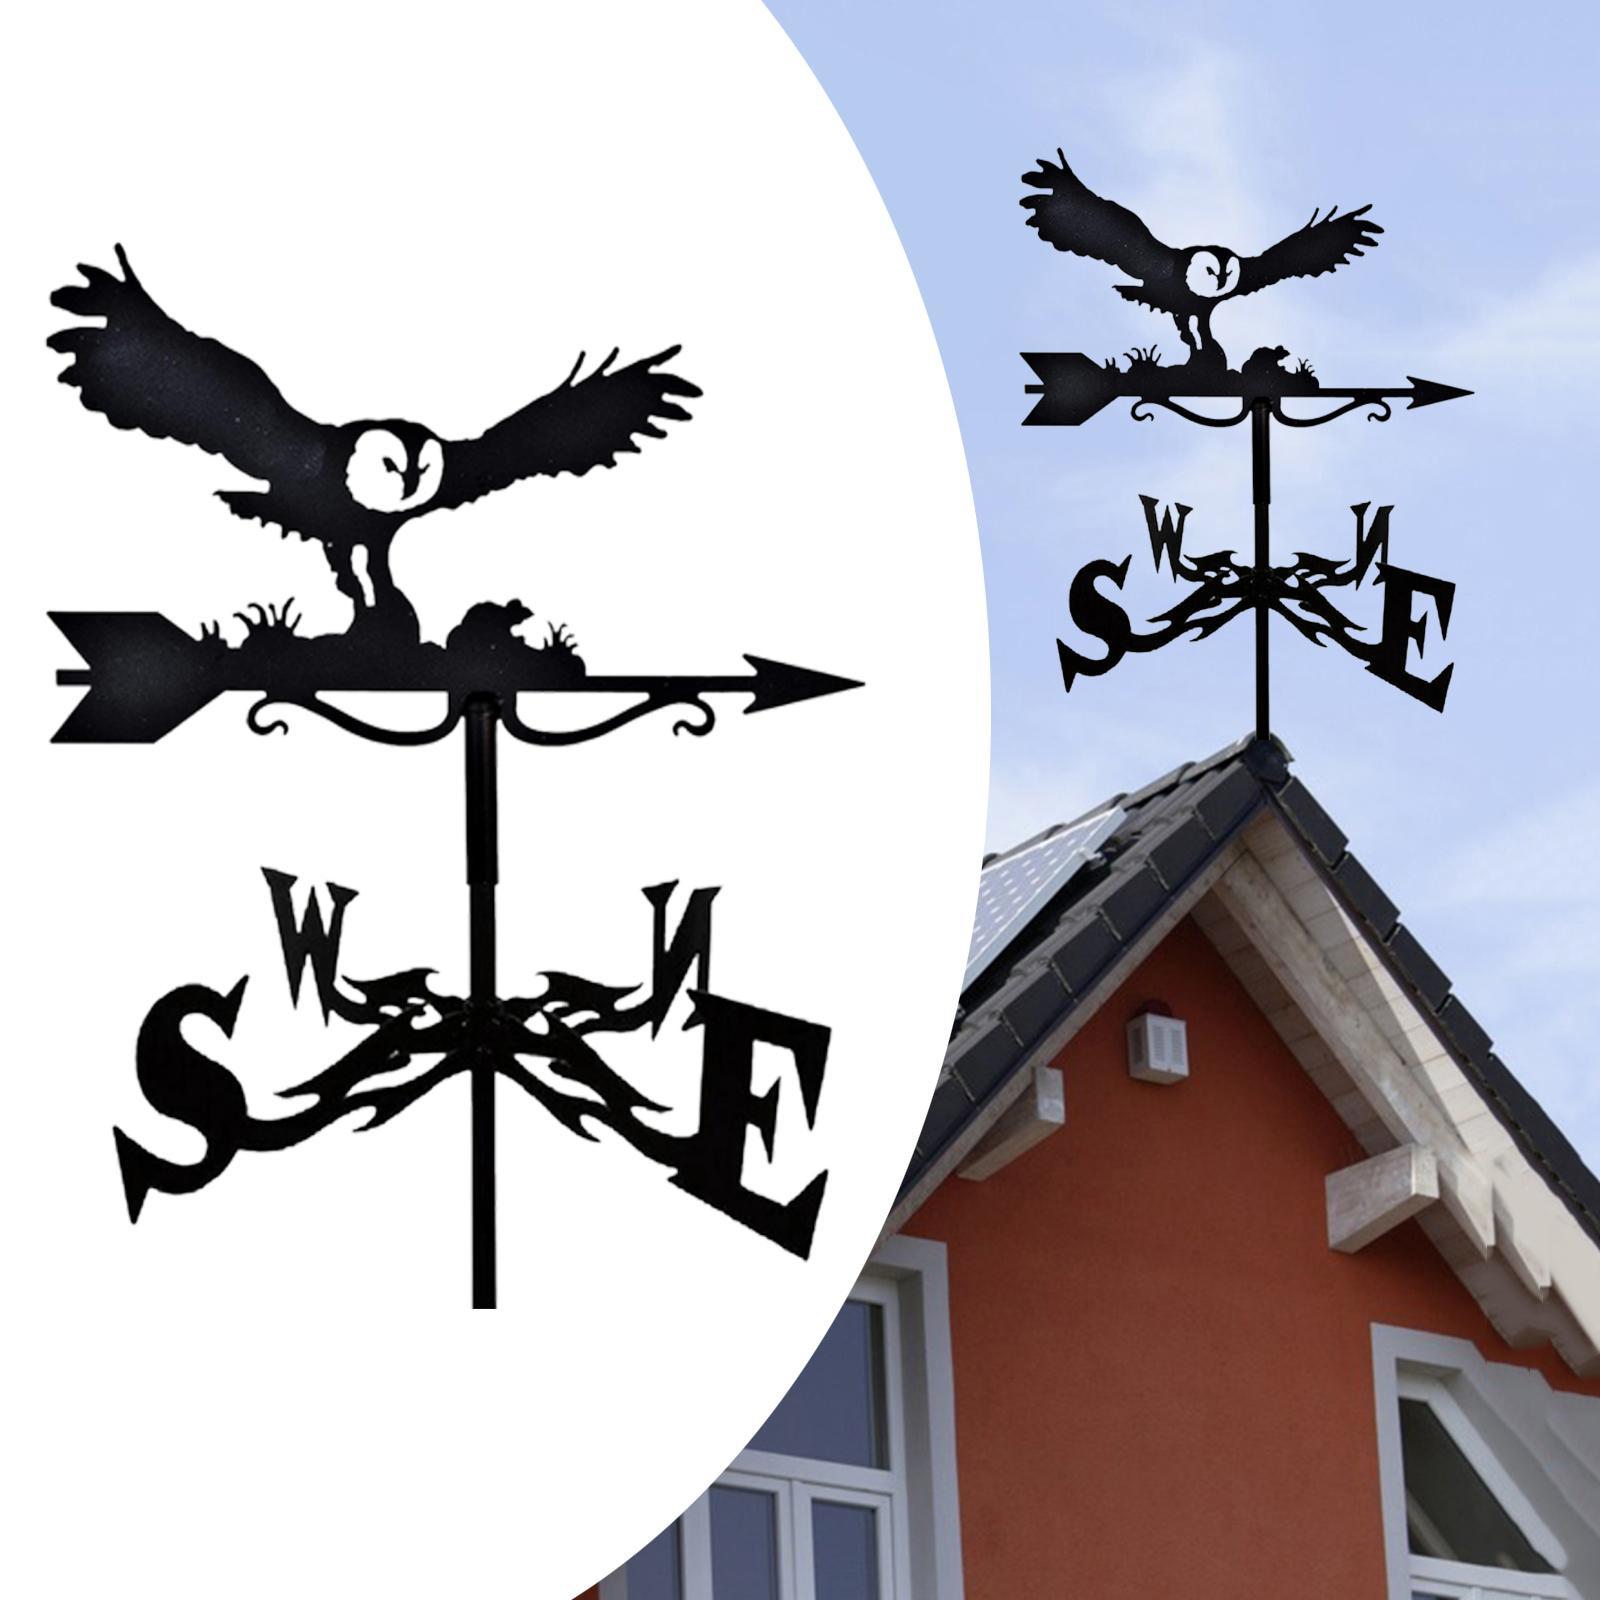 Metal Craft Weather Vane Decorative Stake Weathervane for Garden Yard Patio